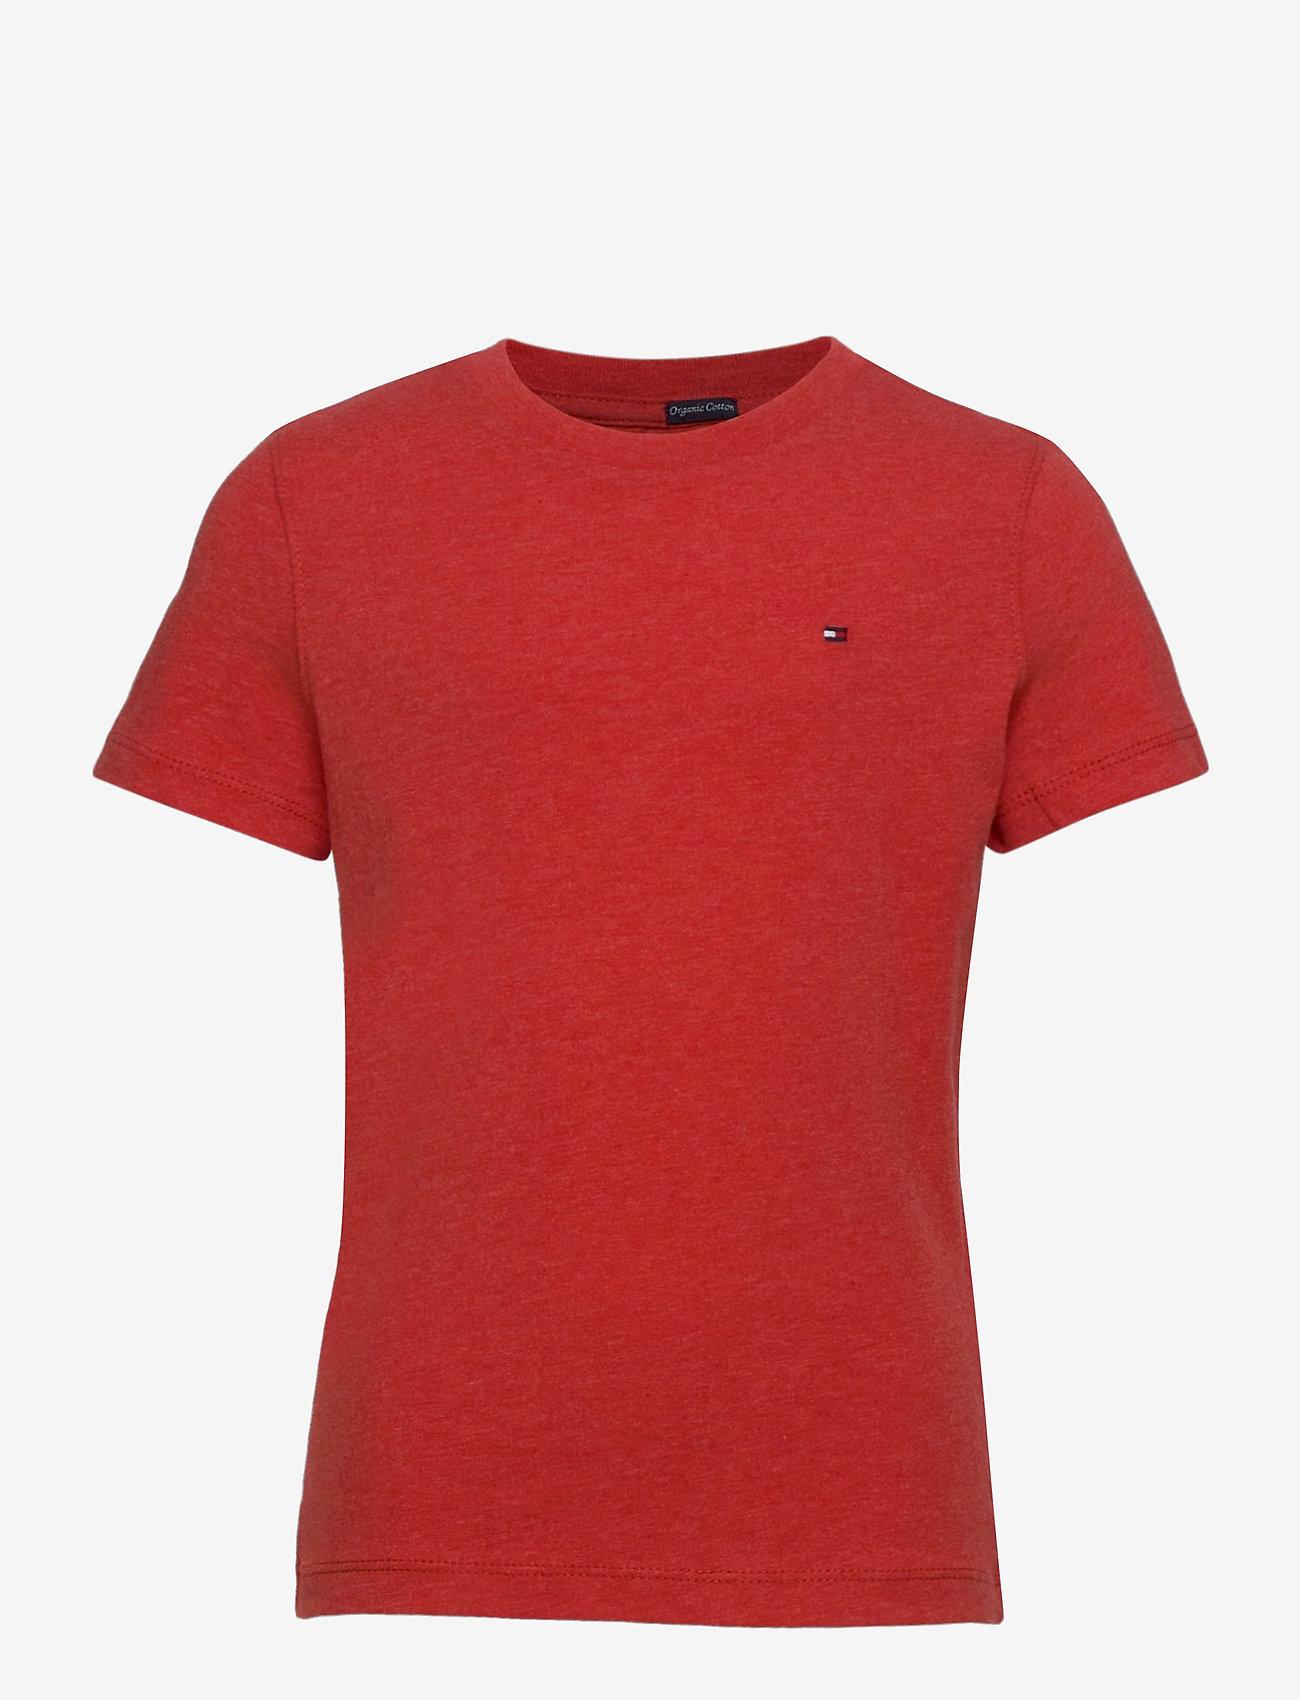 Tommy Hilfiger - BOYS BASIC CN KNIT S - short-sleeved - apple red heather - 0